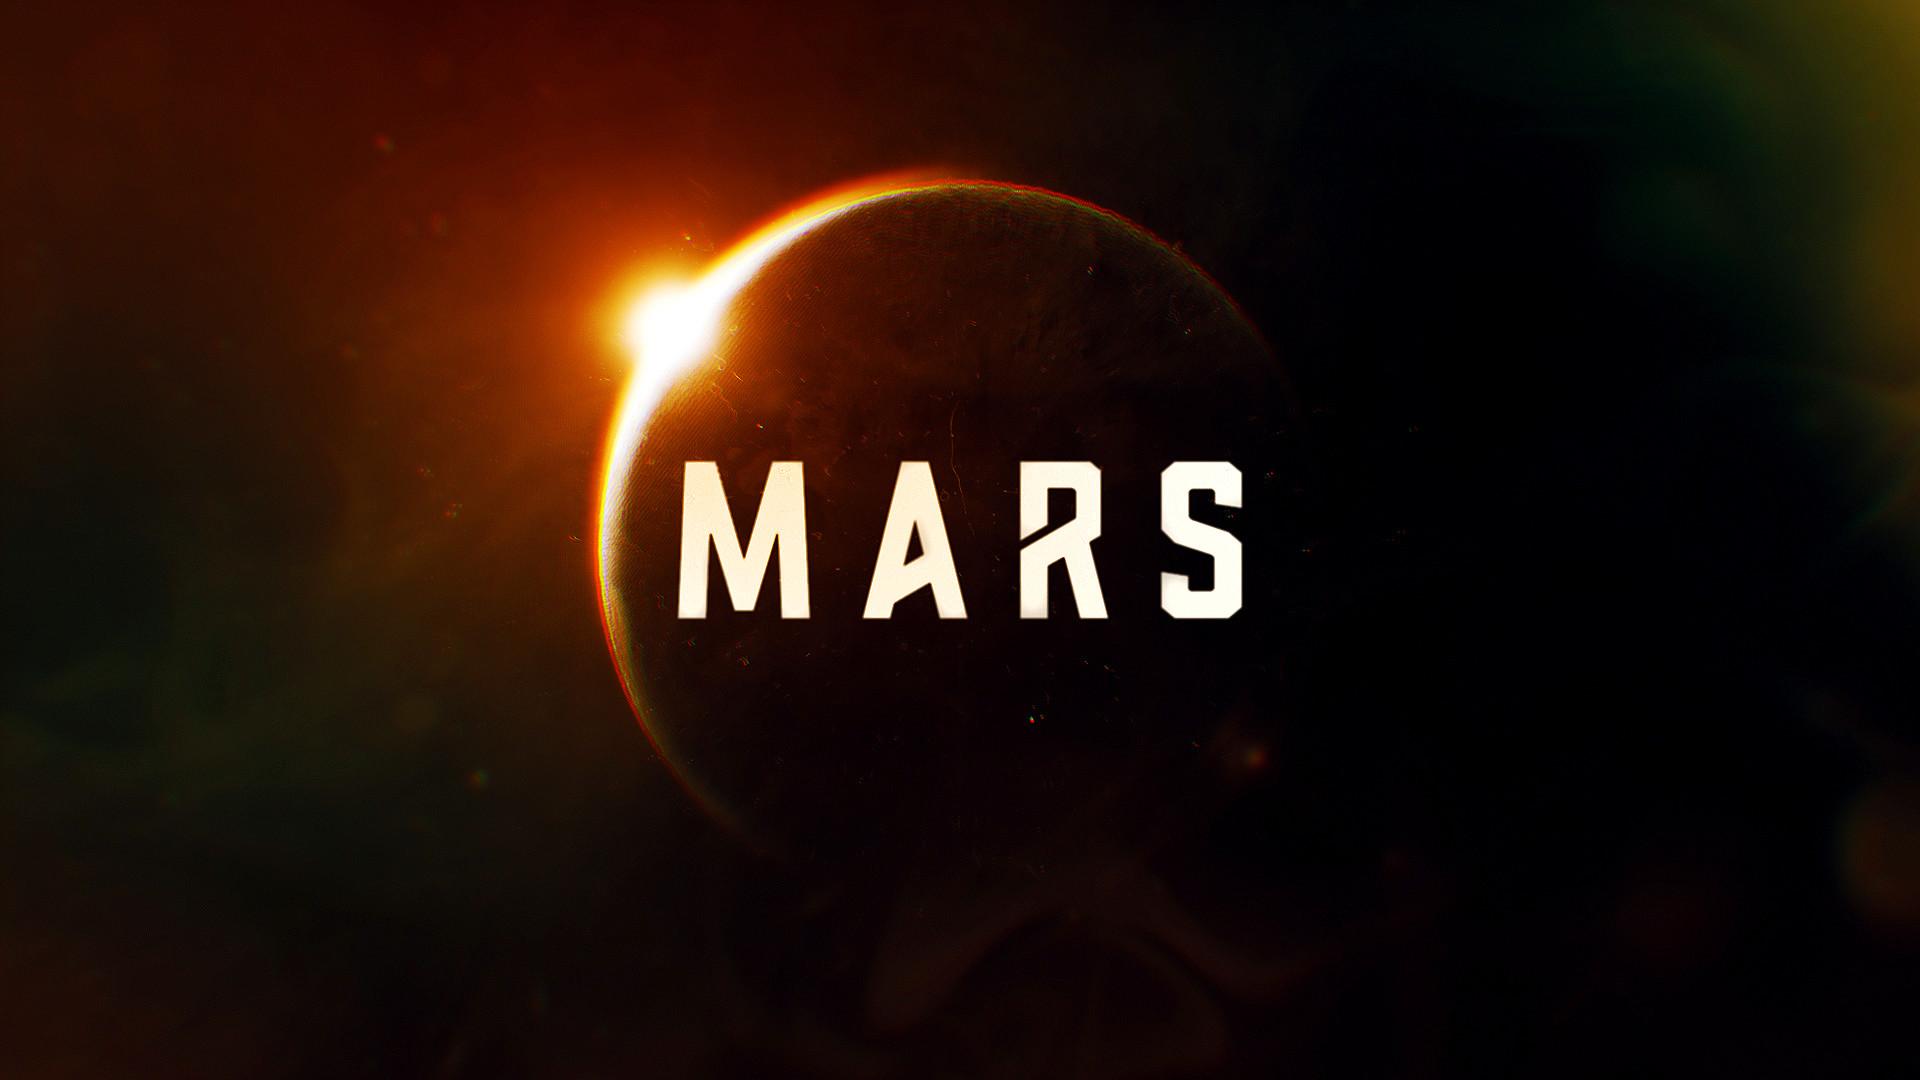 MARS Titles